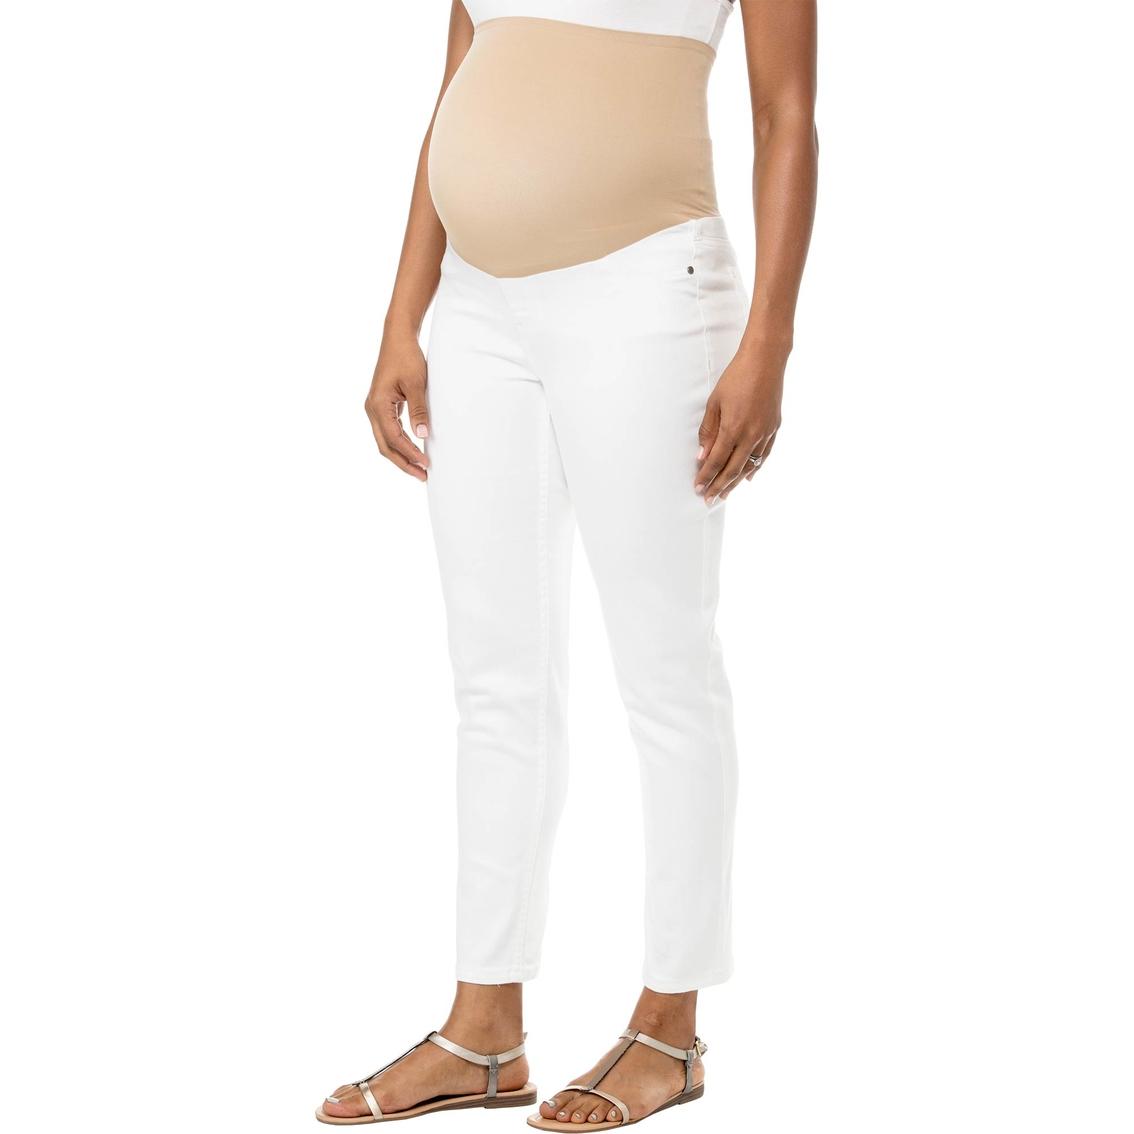 18524856fc7 Liz Lange Maternity Over The Belly Skinny Jeans | Pants | Apparel ...